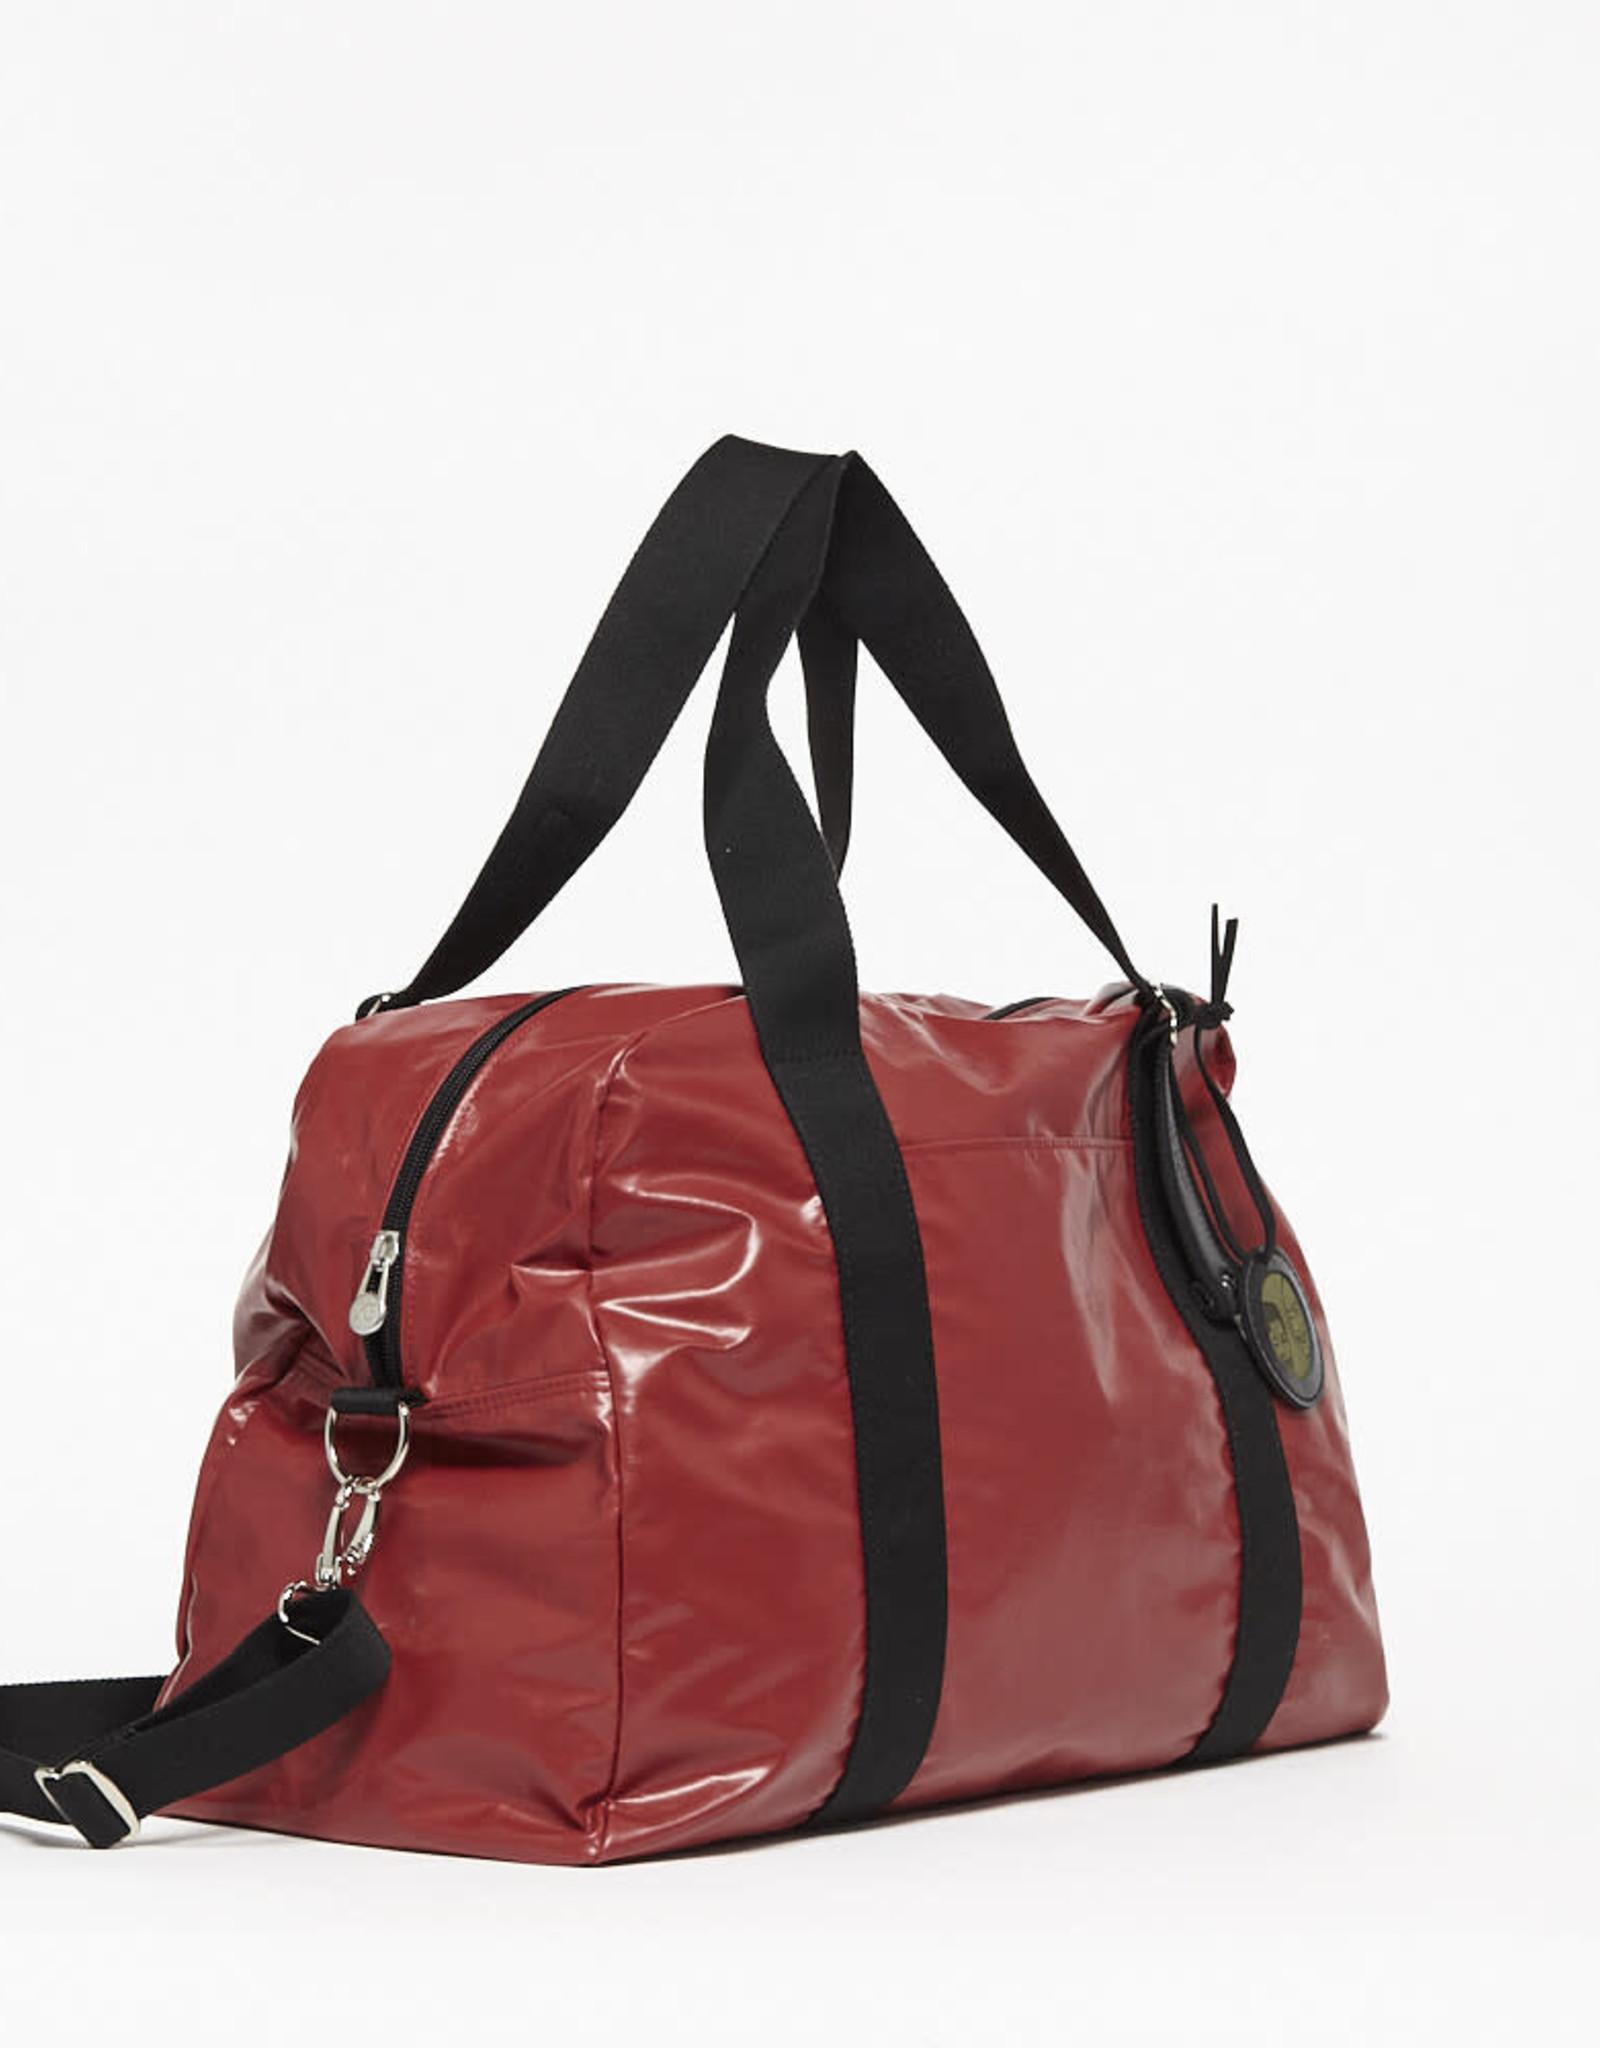 JACK GOMME Walli Weekend Bag